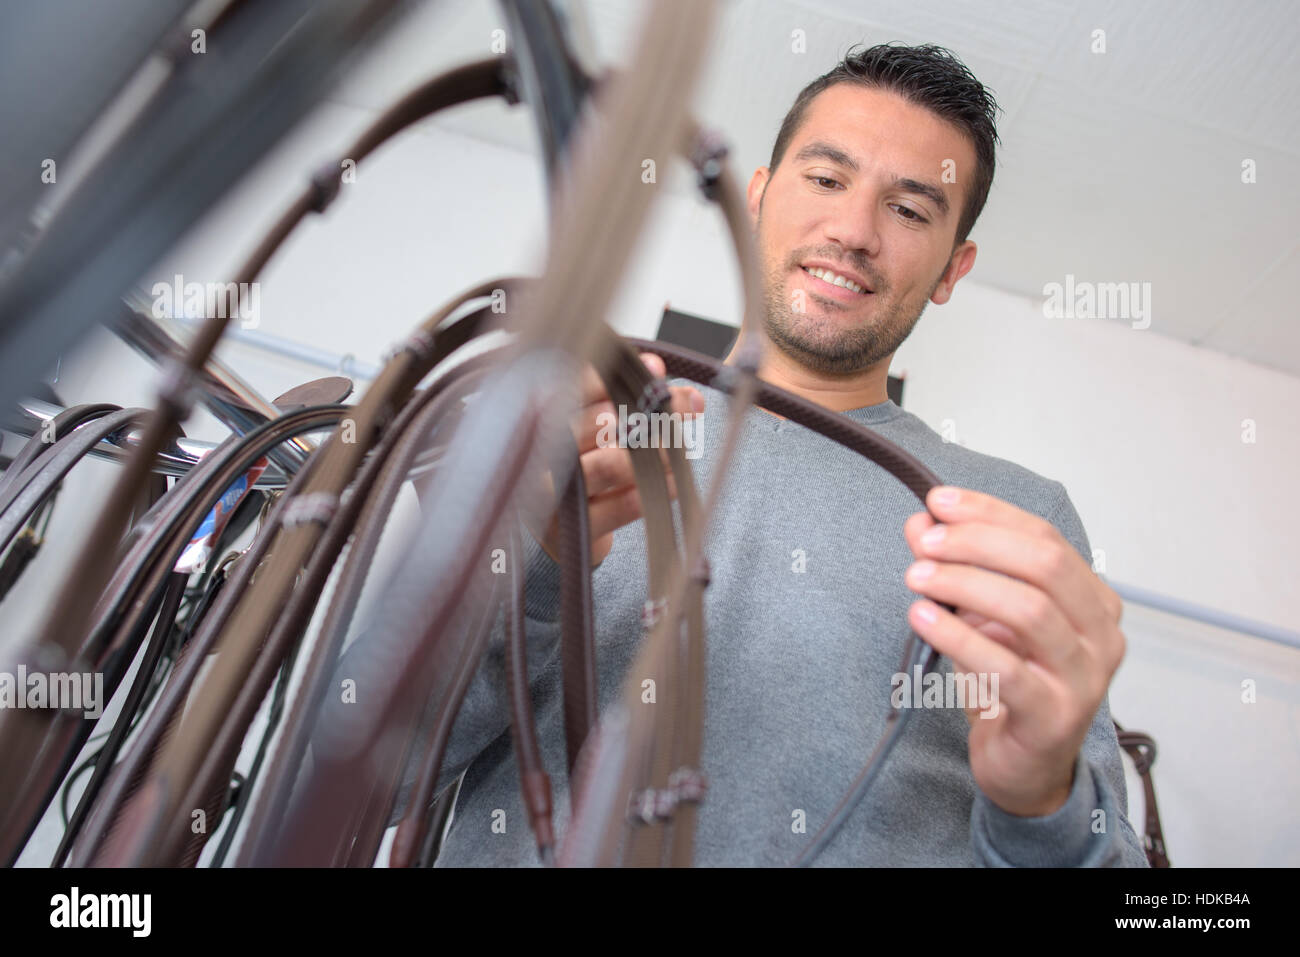 man buying bridle - Stock Image